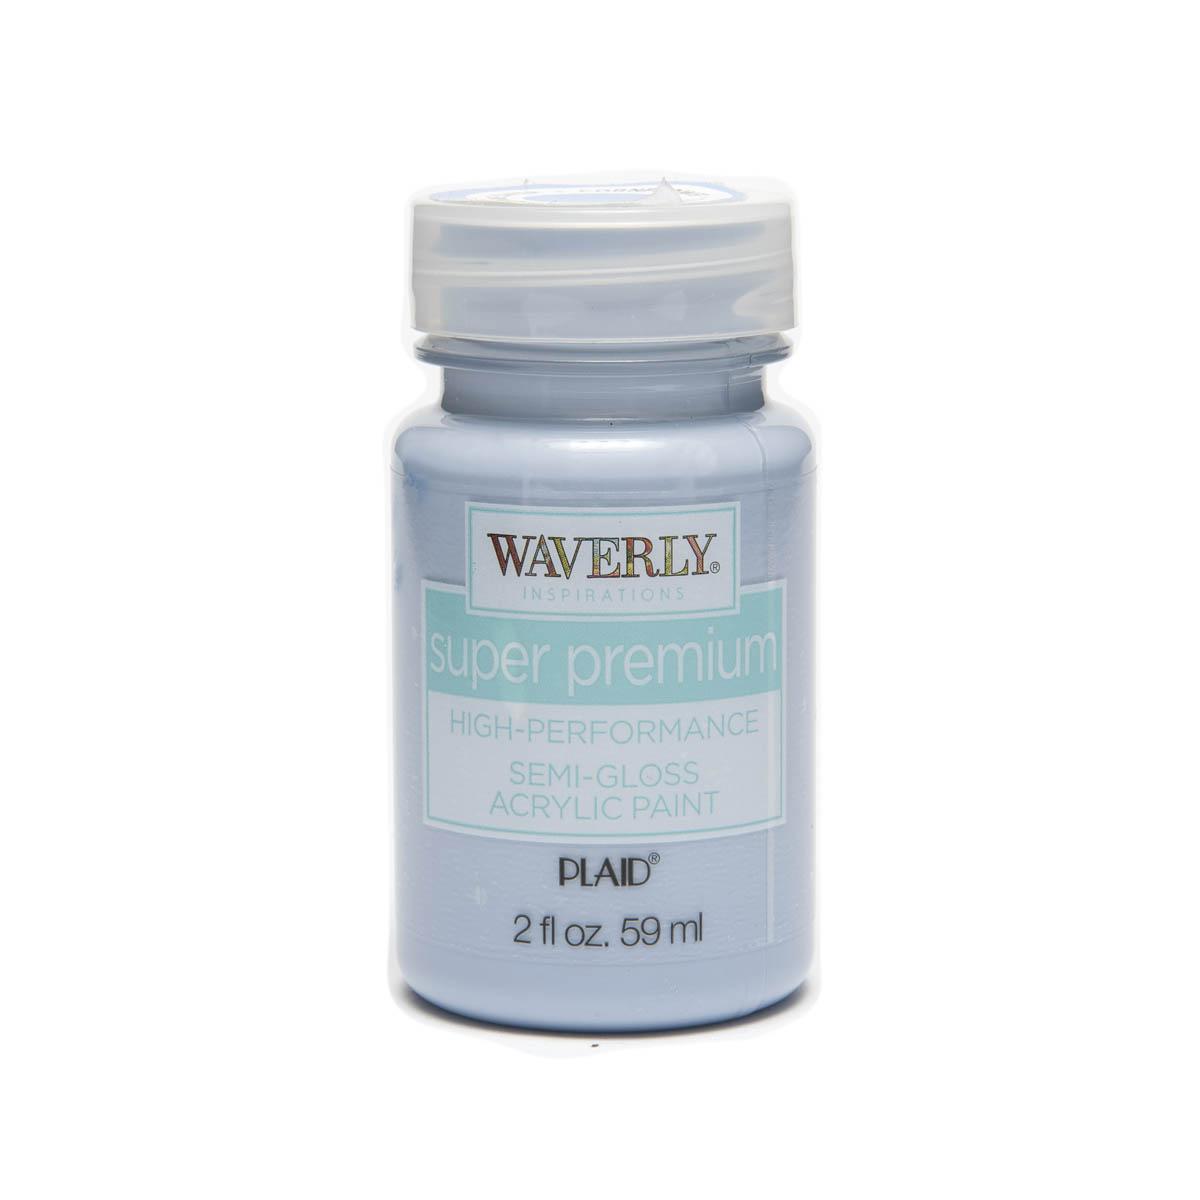 Waverly ® Inspirations Super Premium Semi-Gloss Acrylic Paint - Cornflower, 2 oz.